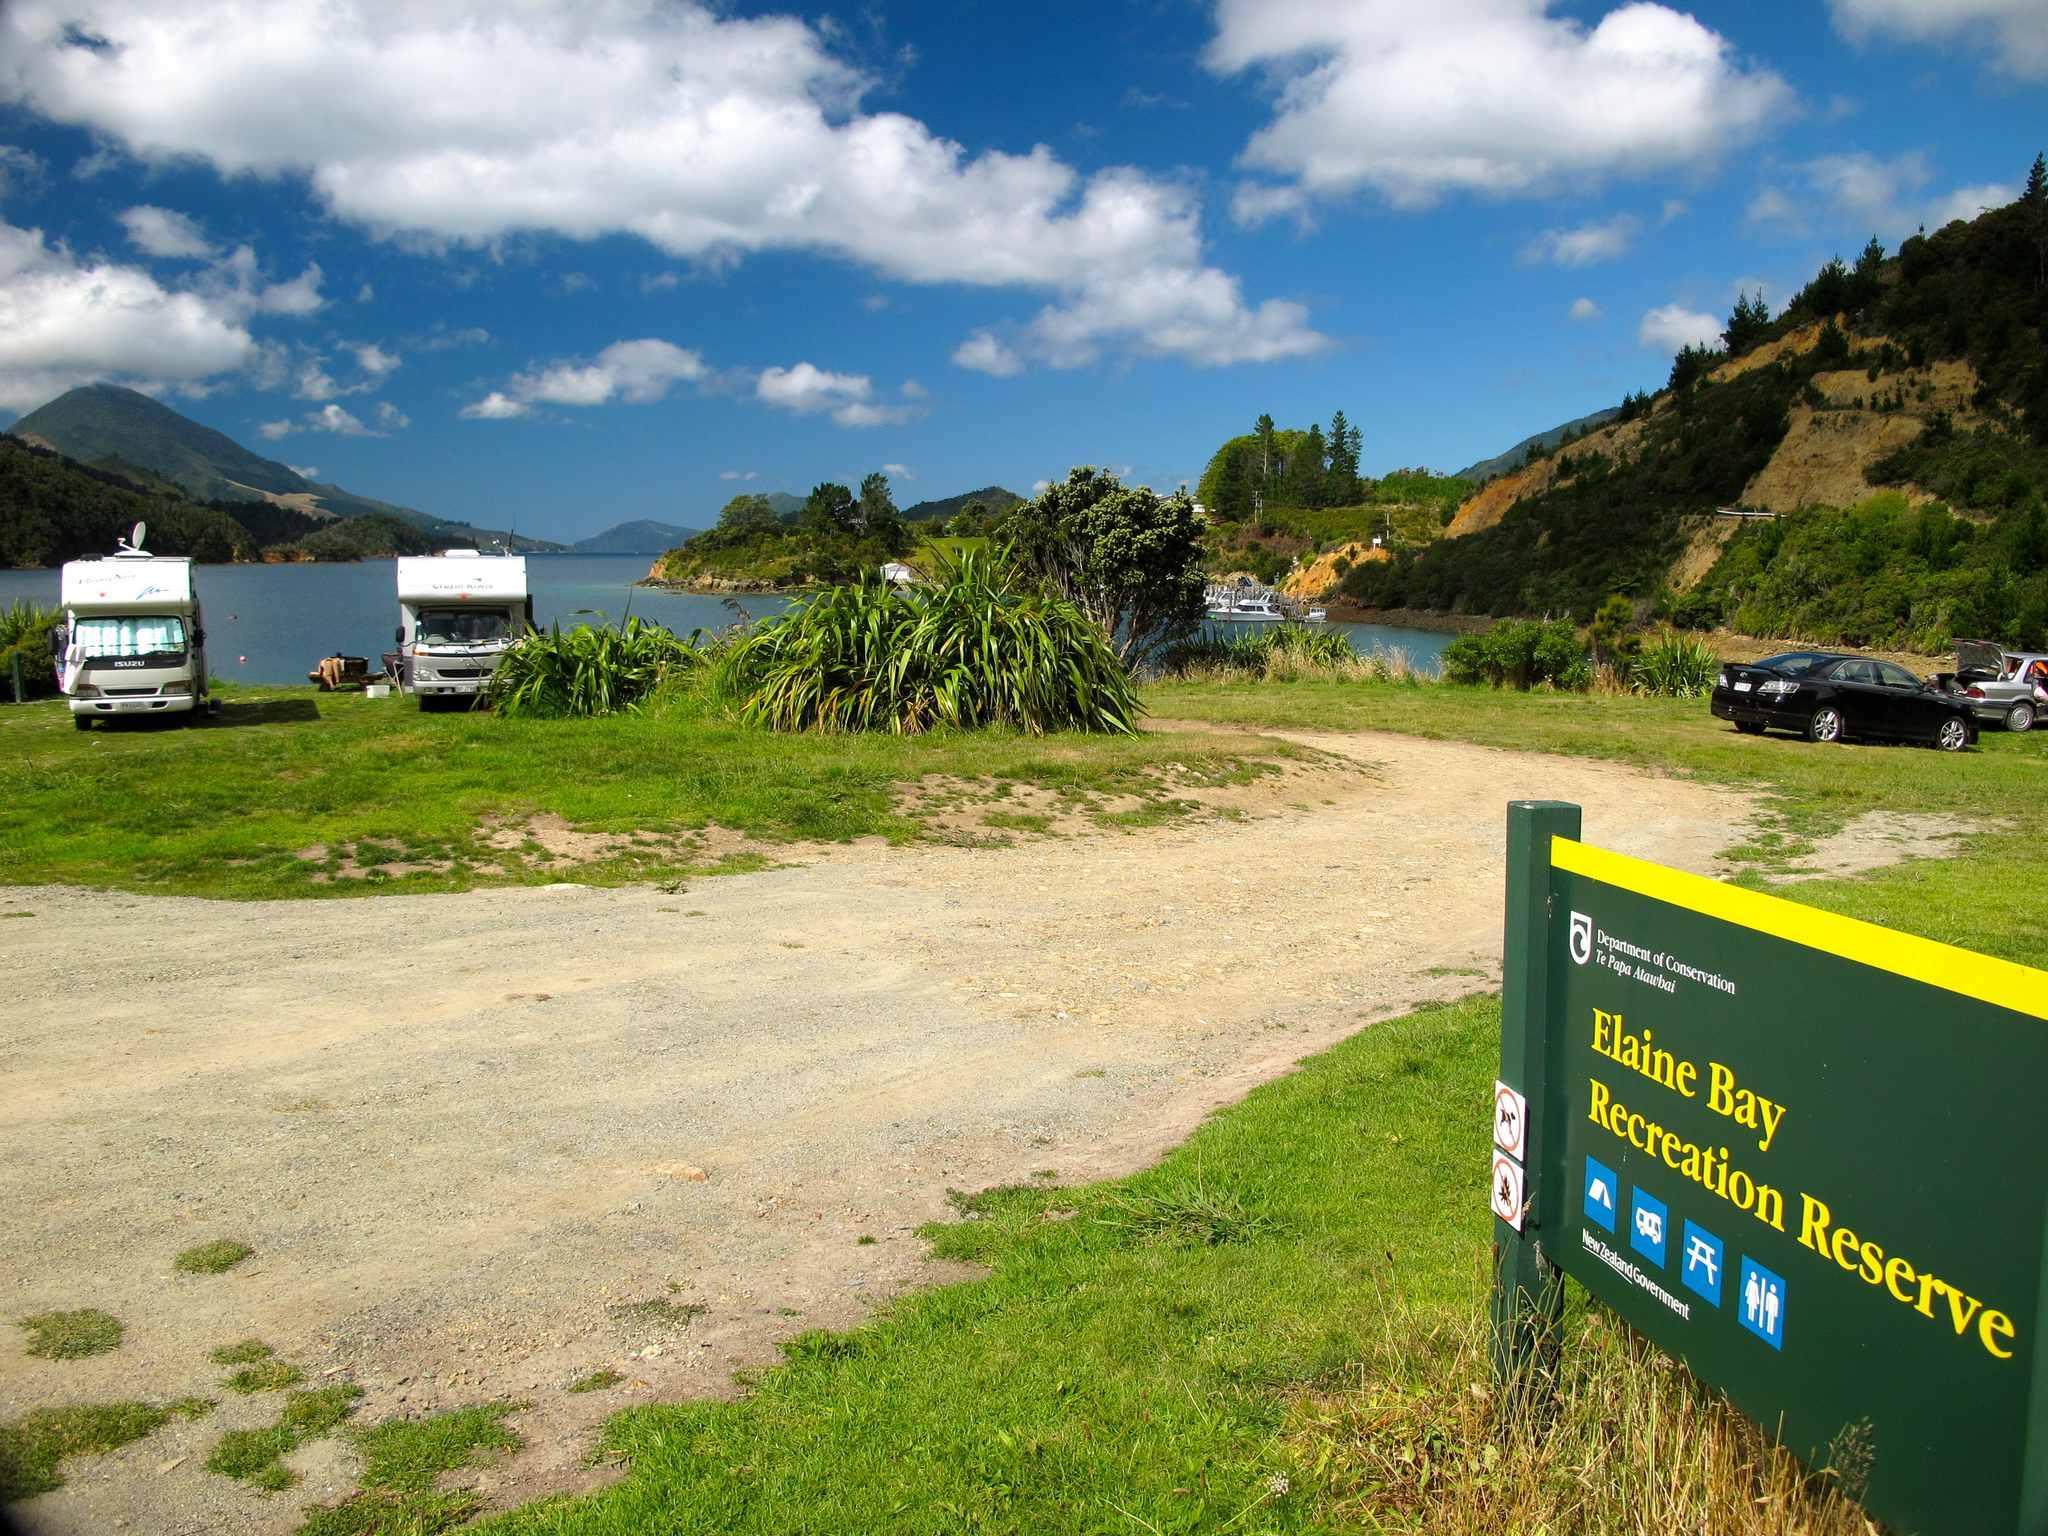 Elaine Bay Camping Area